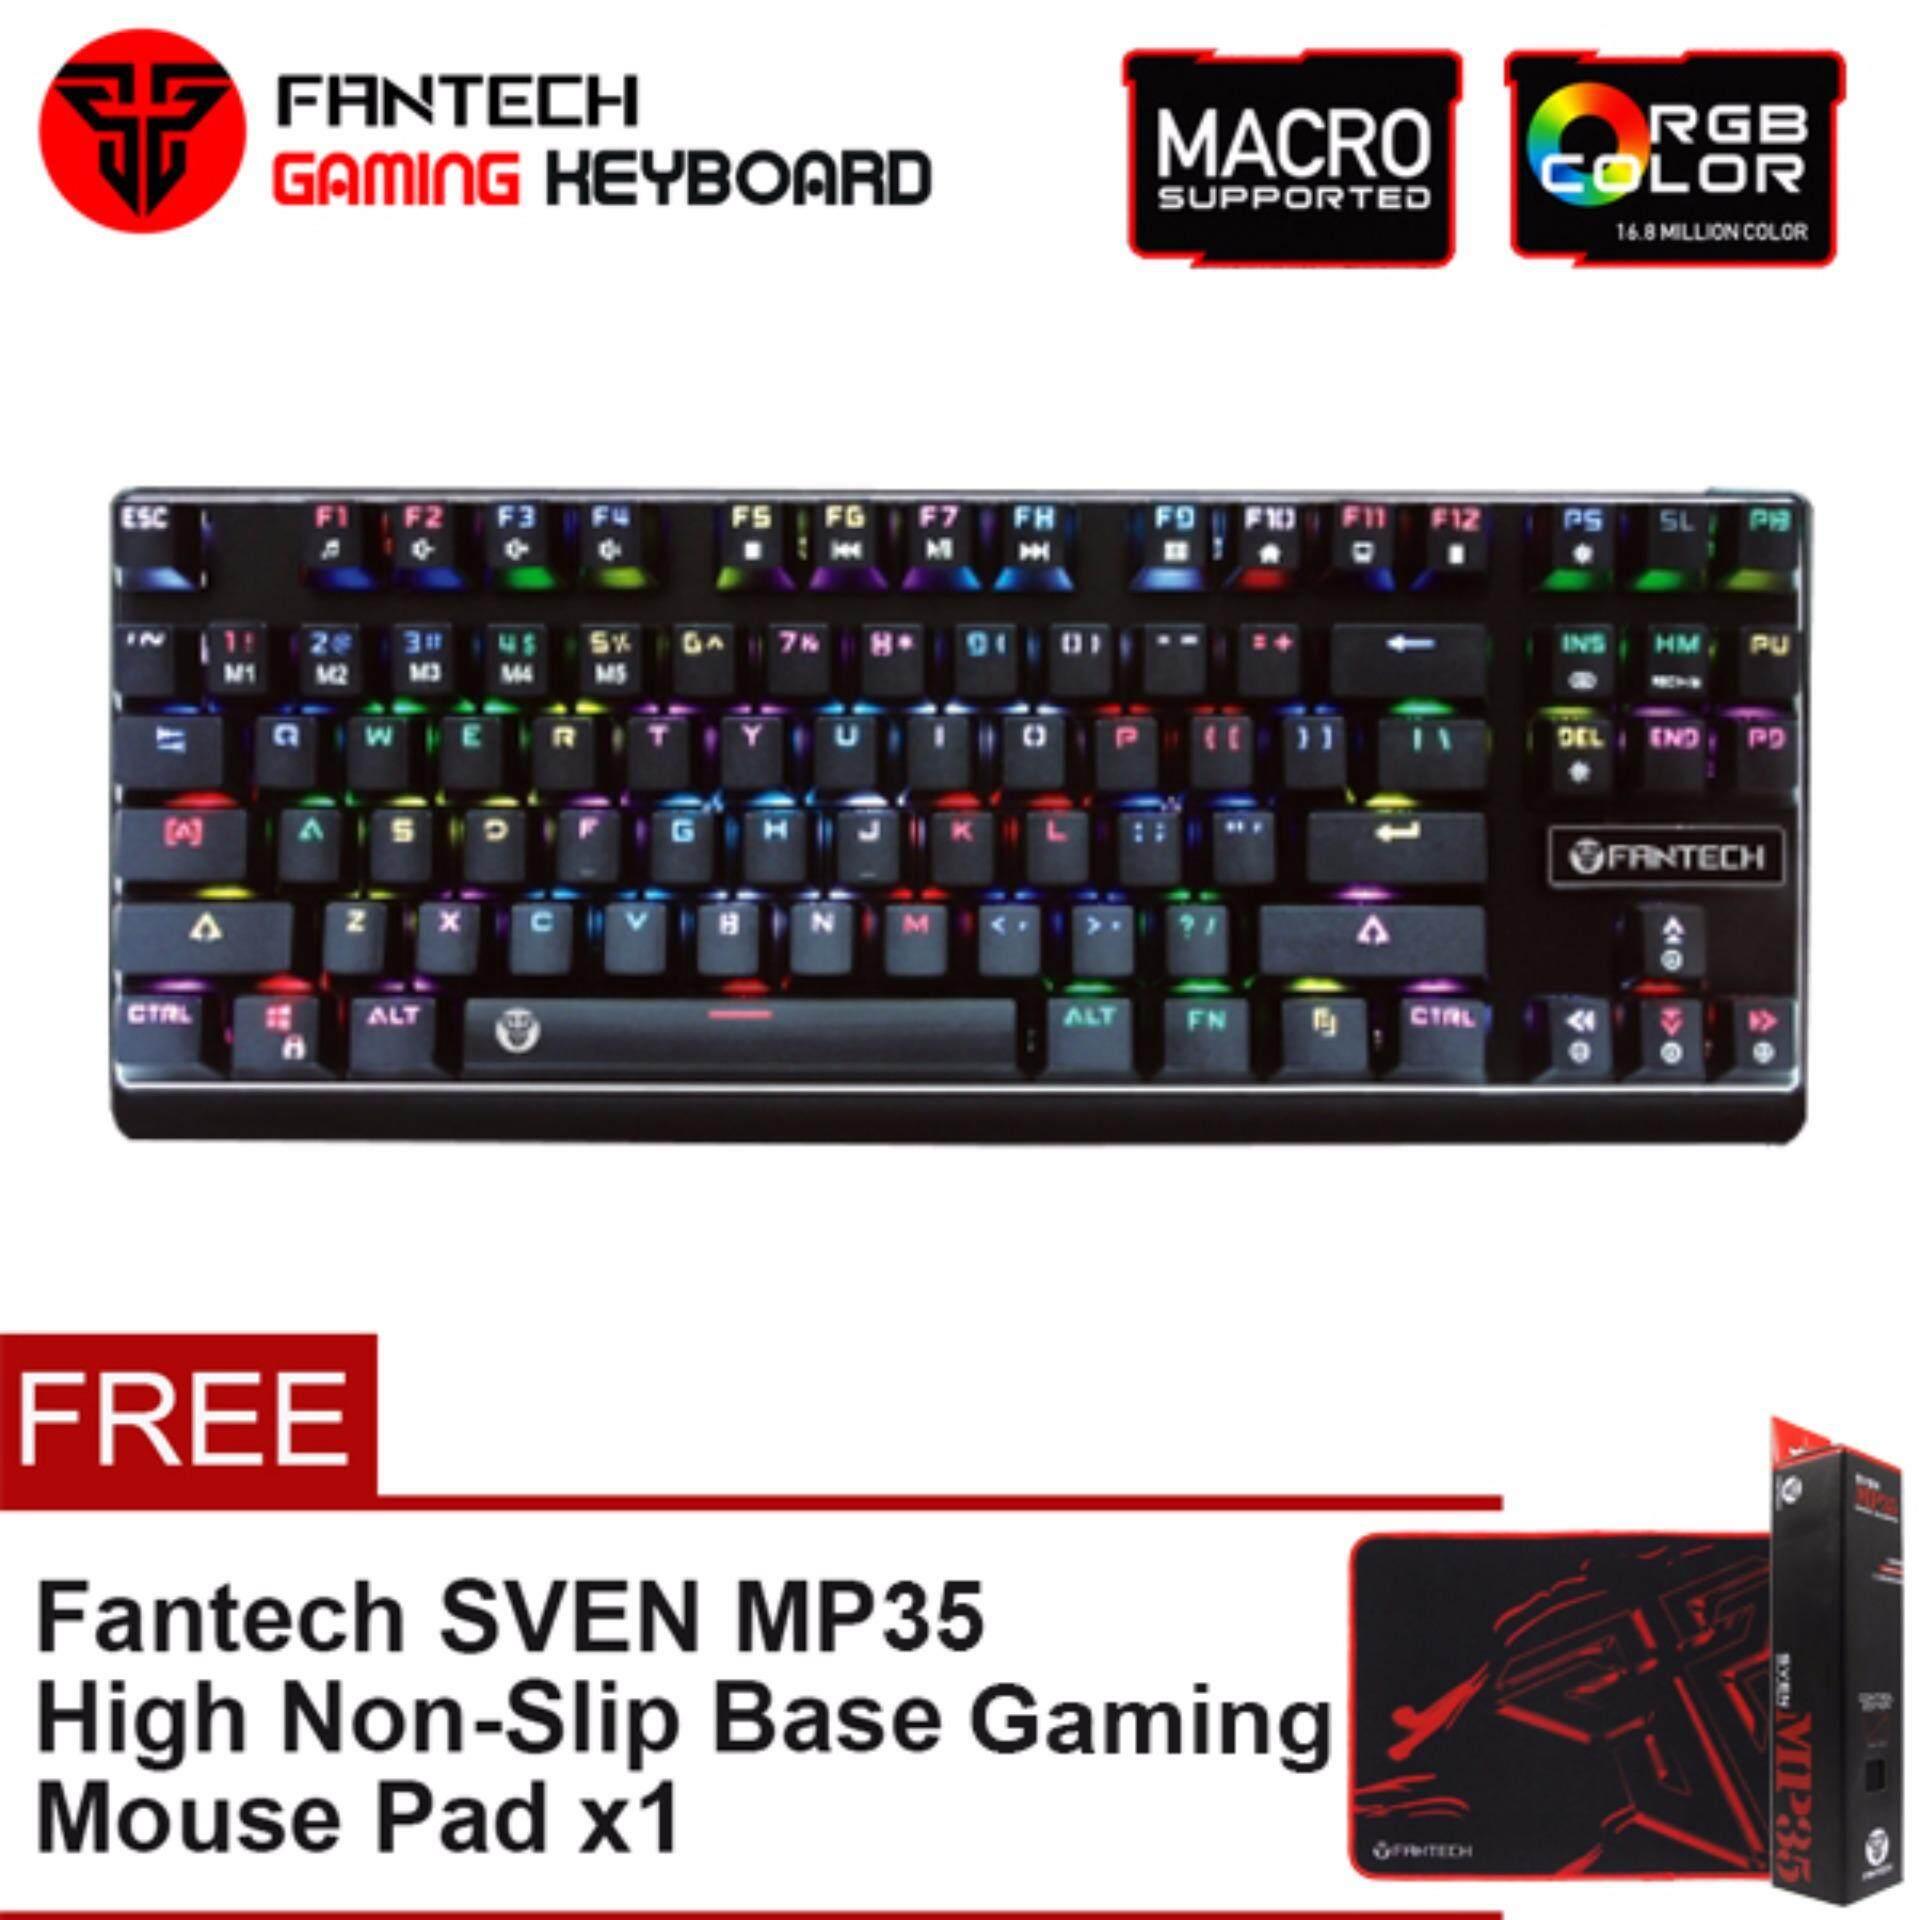 FANTECH MK871 RGB Phantheon Mechanical Gaming Keyboard Tournament Edition Anti-Ghosting with 10 Spectrum Modes